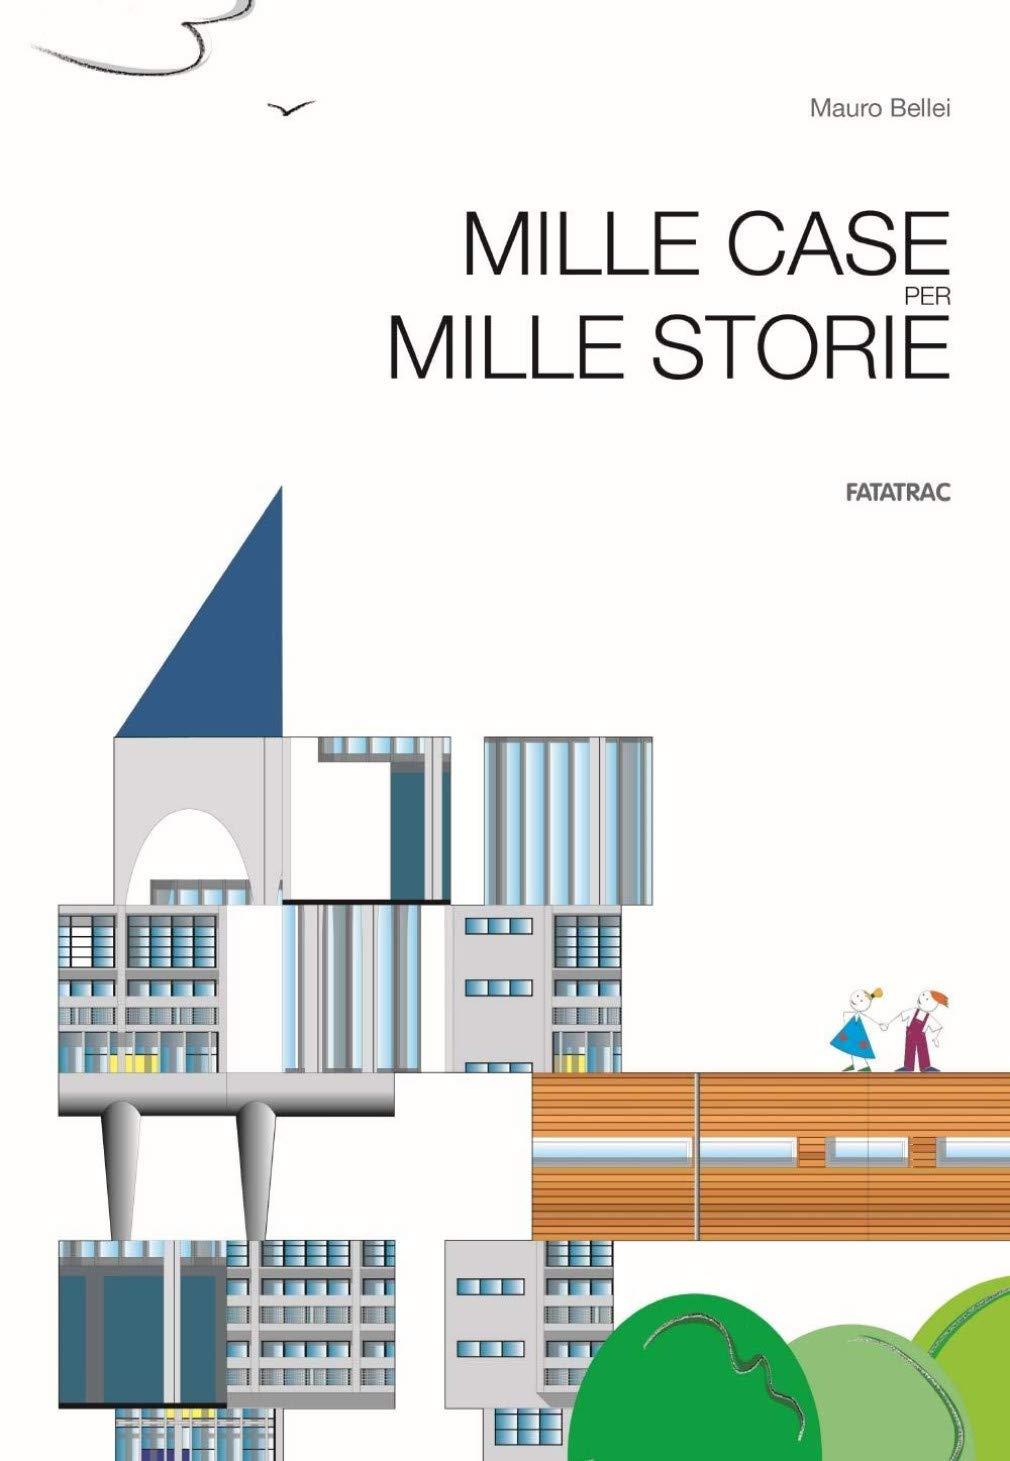 mille case mille storie 2b